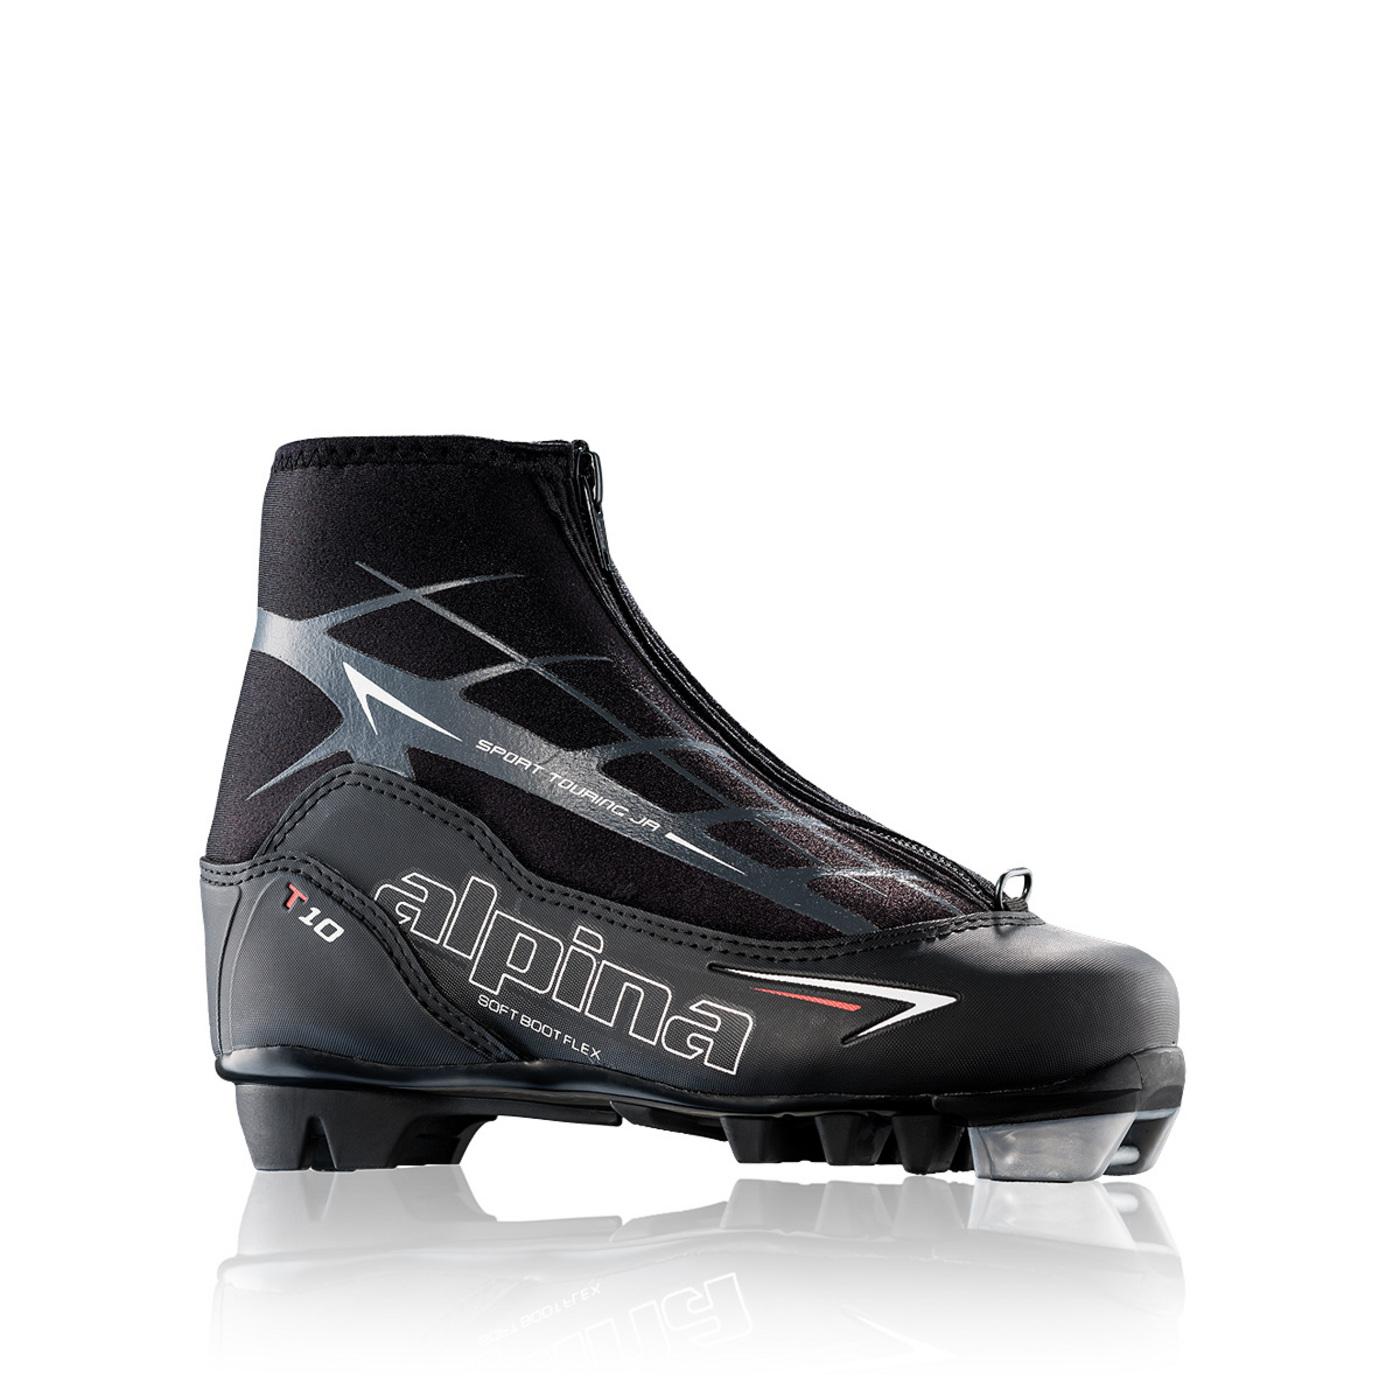 Alpina T Junior Nordic Boots Fontana Sports - Alpina cross country boots